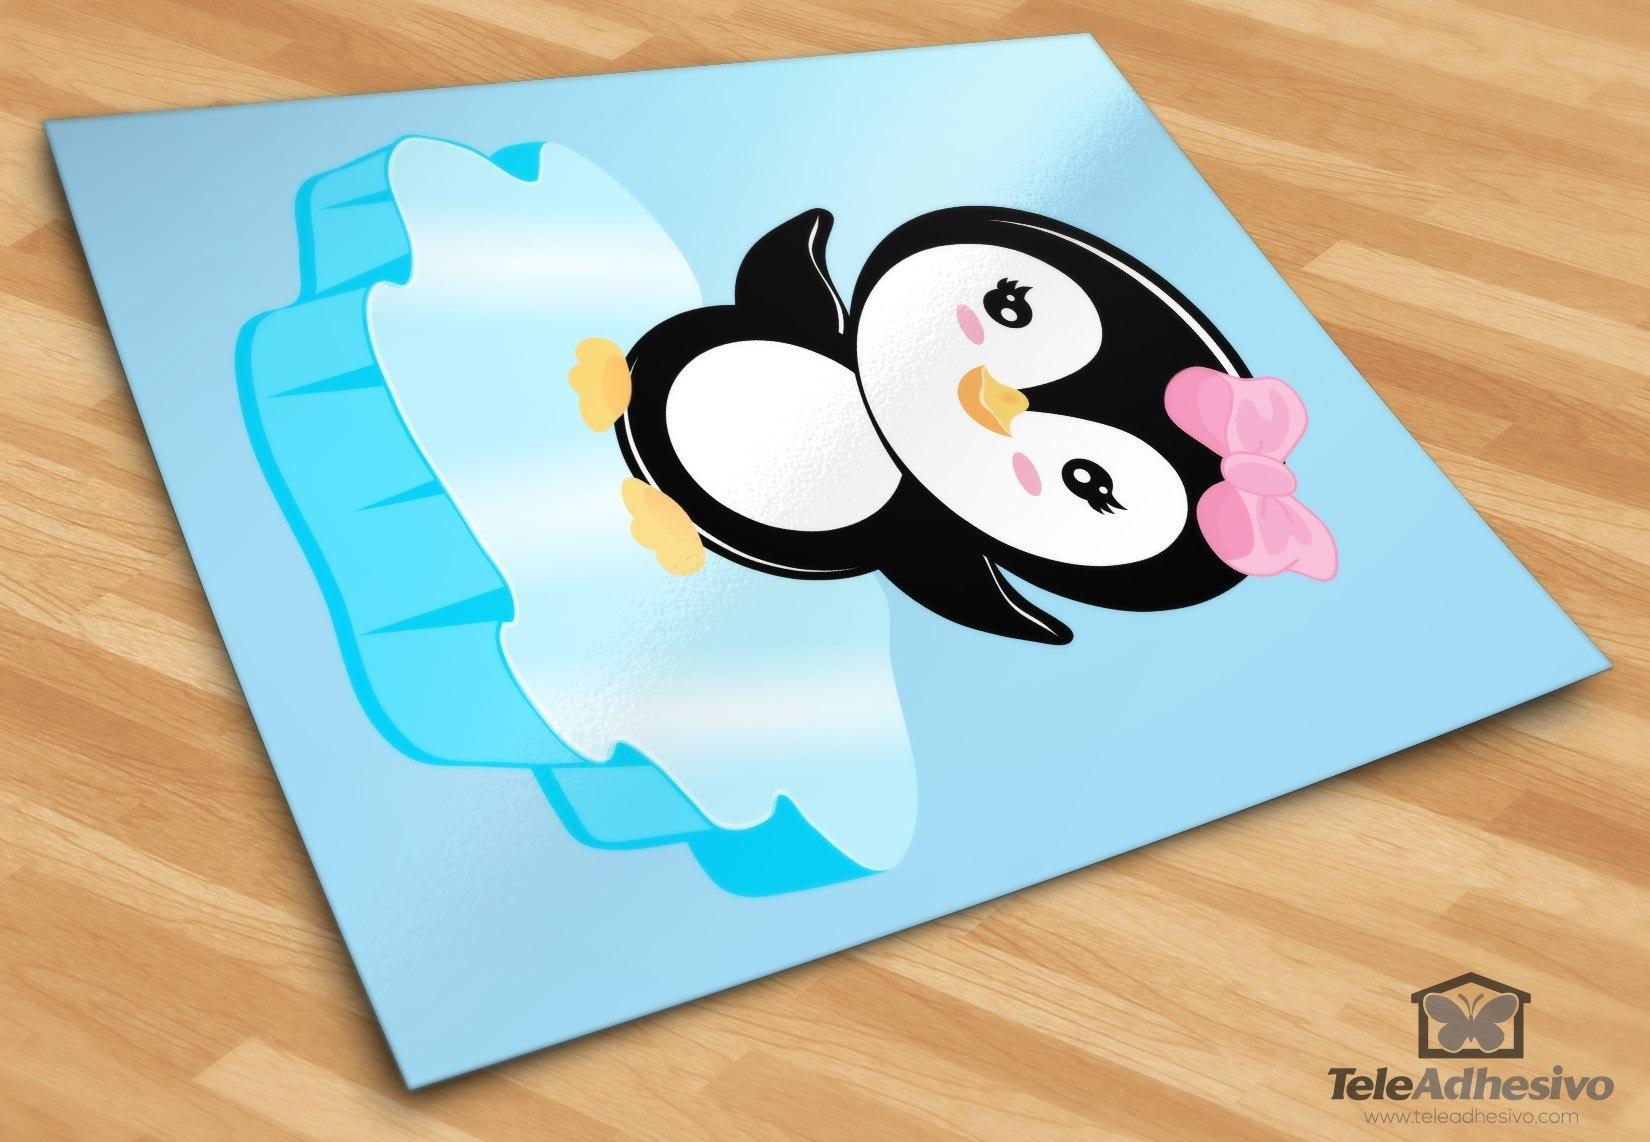 Kinderzimmer Wandtattoo: Penguin Eis